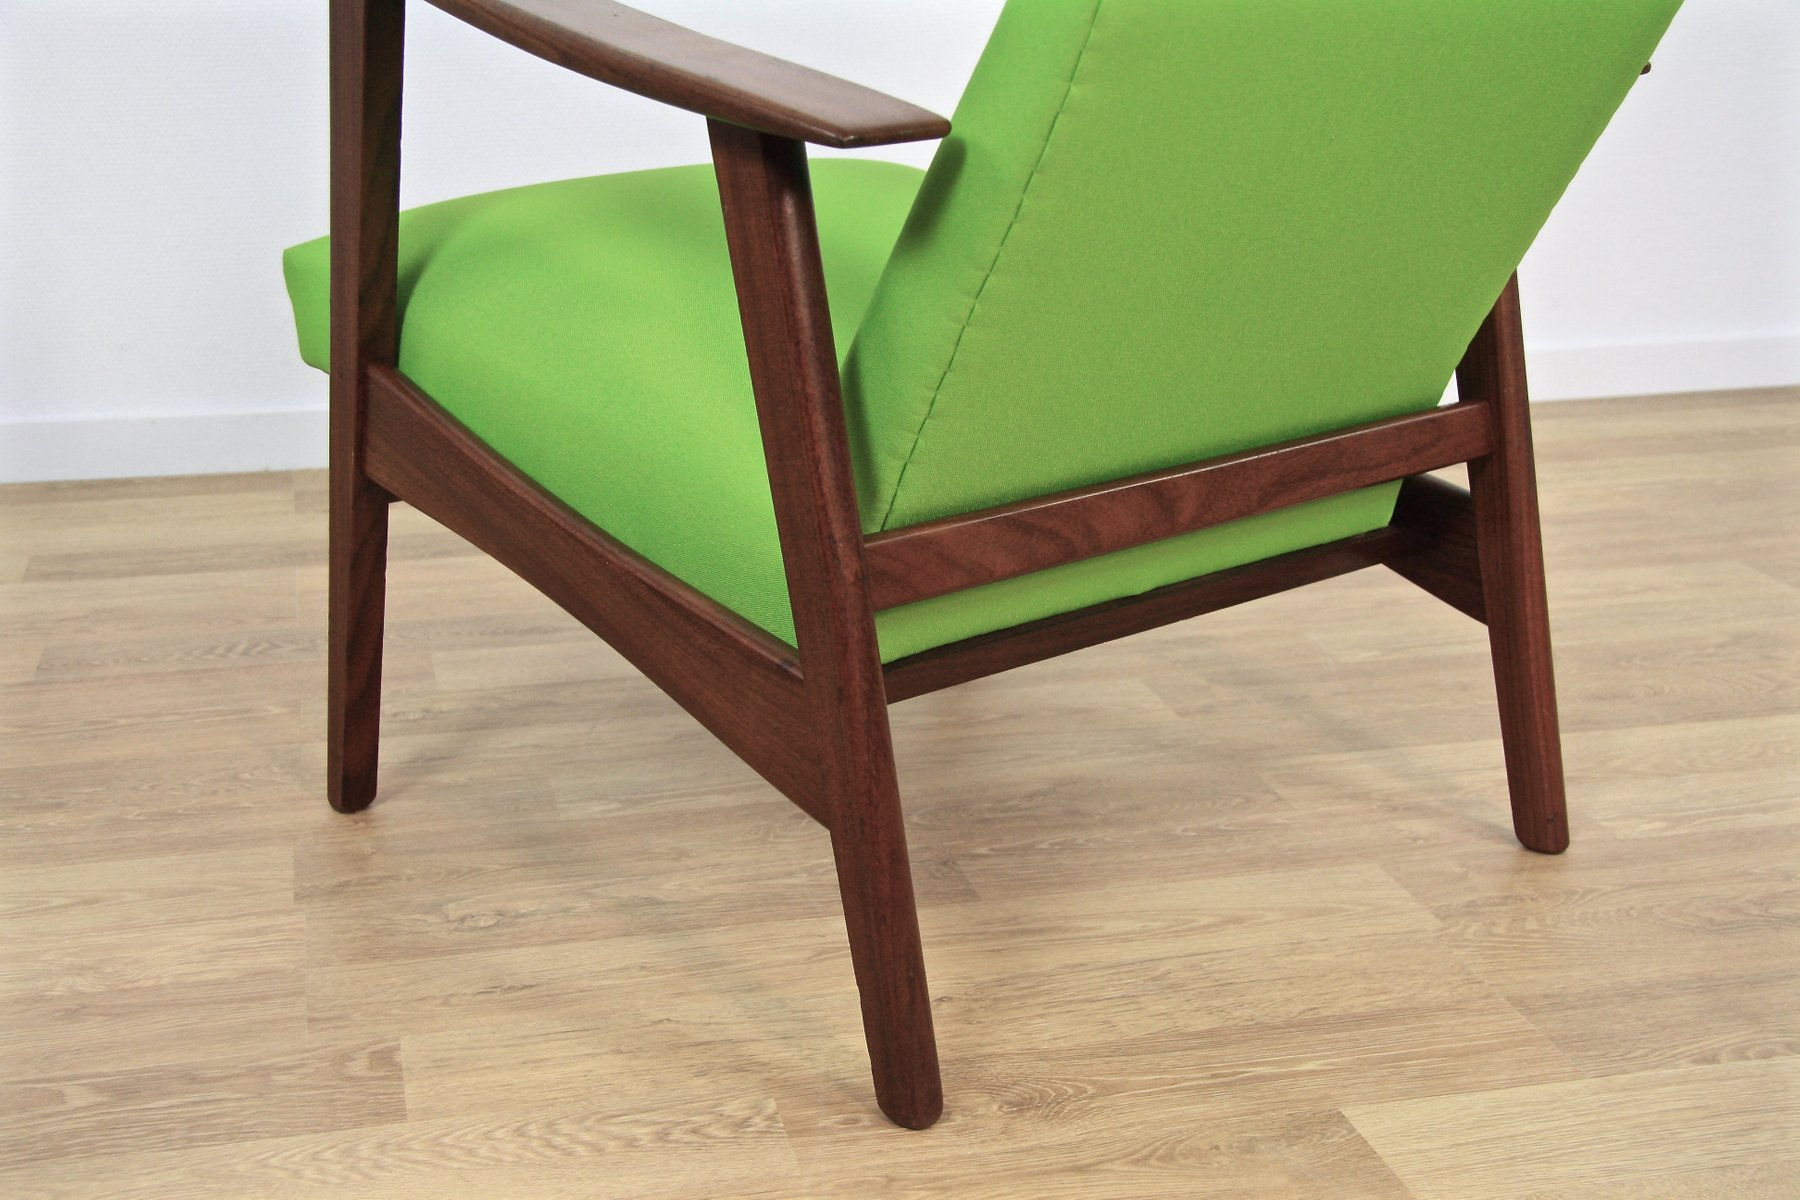 chaise de salon mid century en teck tissu vert danemark 1960s en vente sur pamono. Black Bedroom Furniture Sets. Home Design Ideas